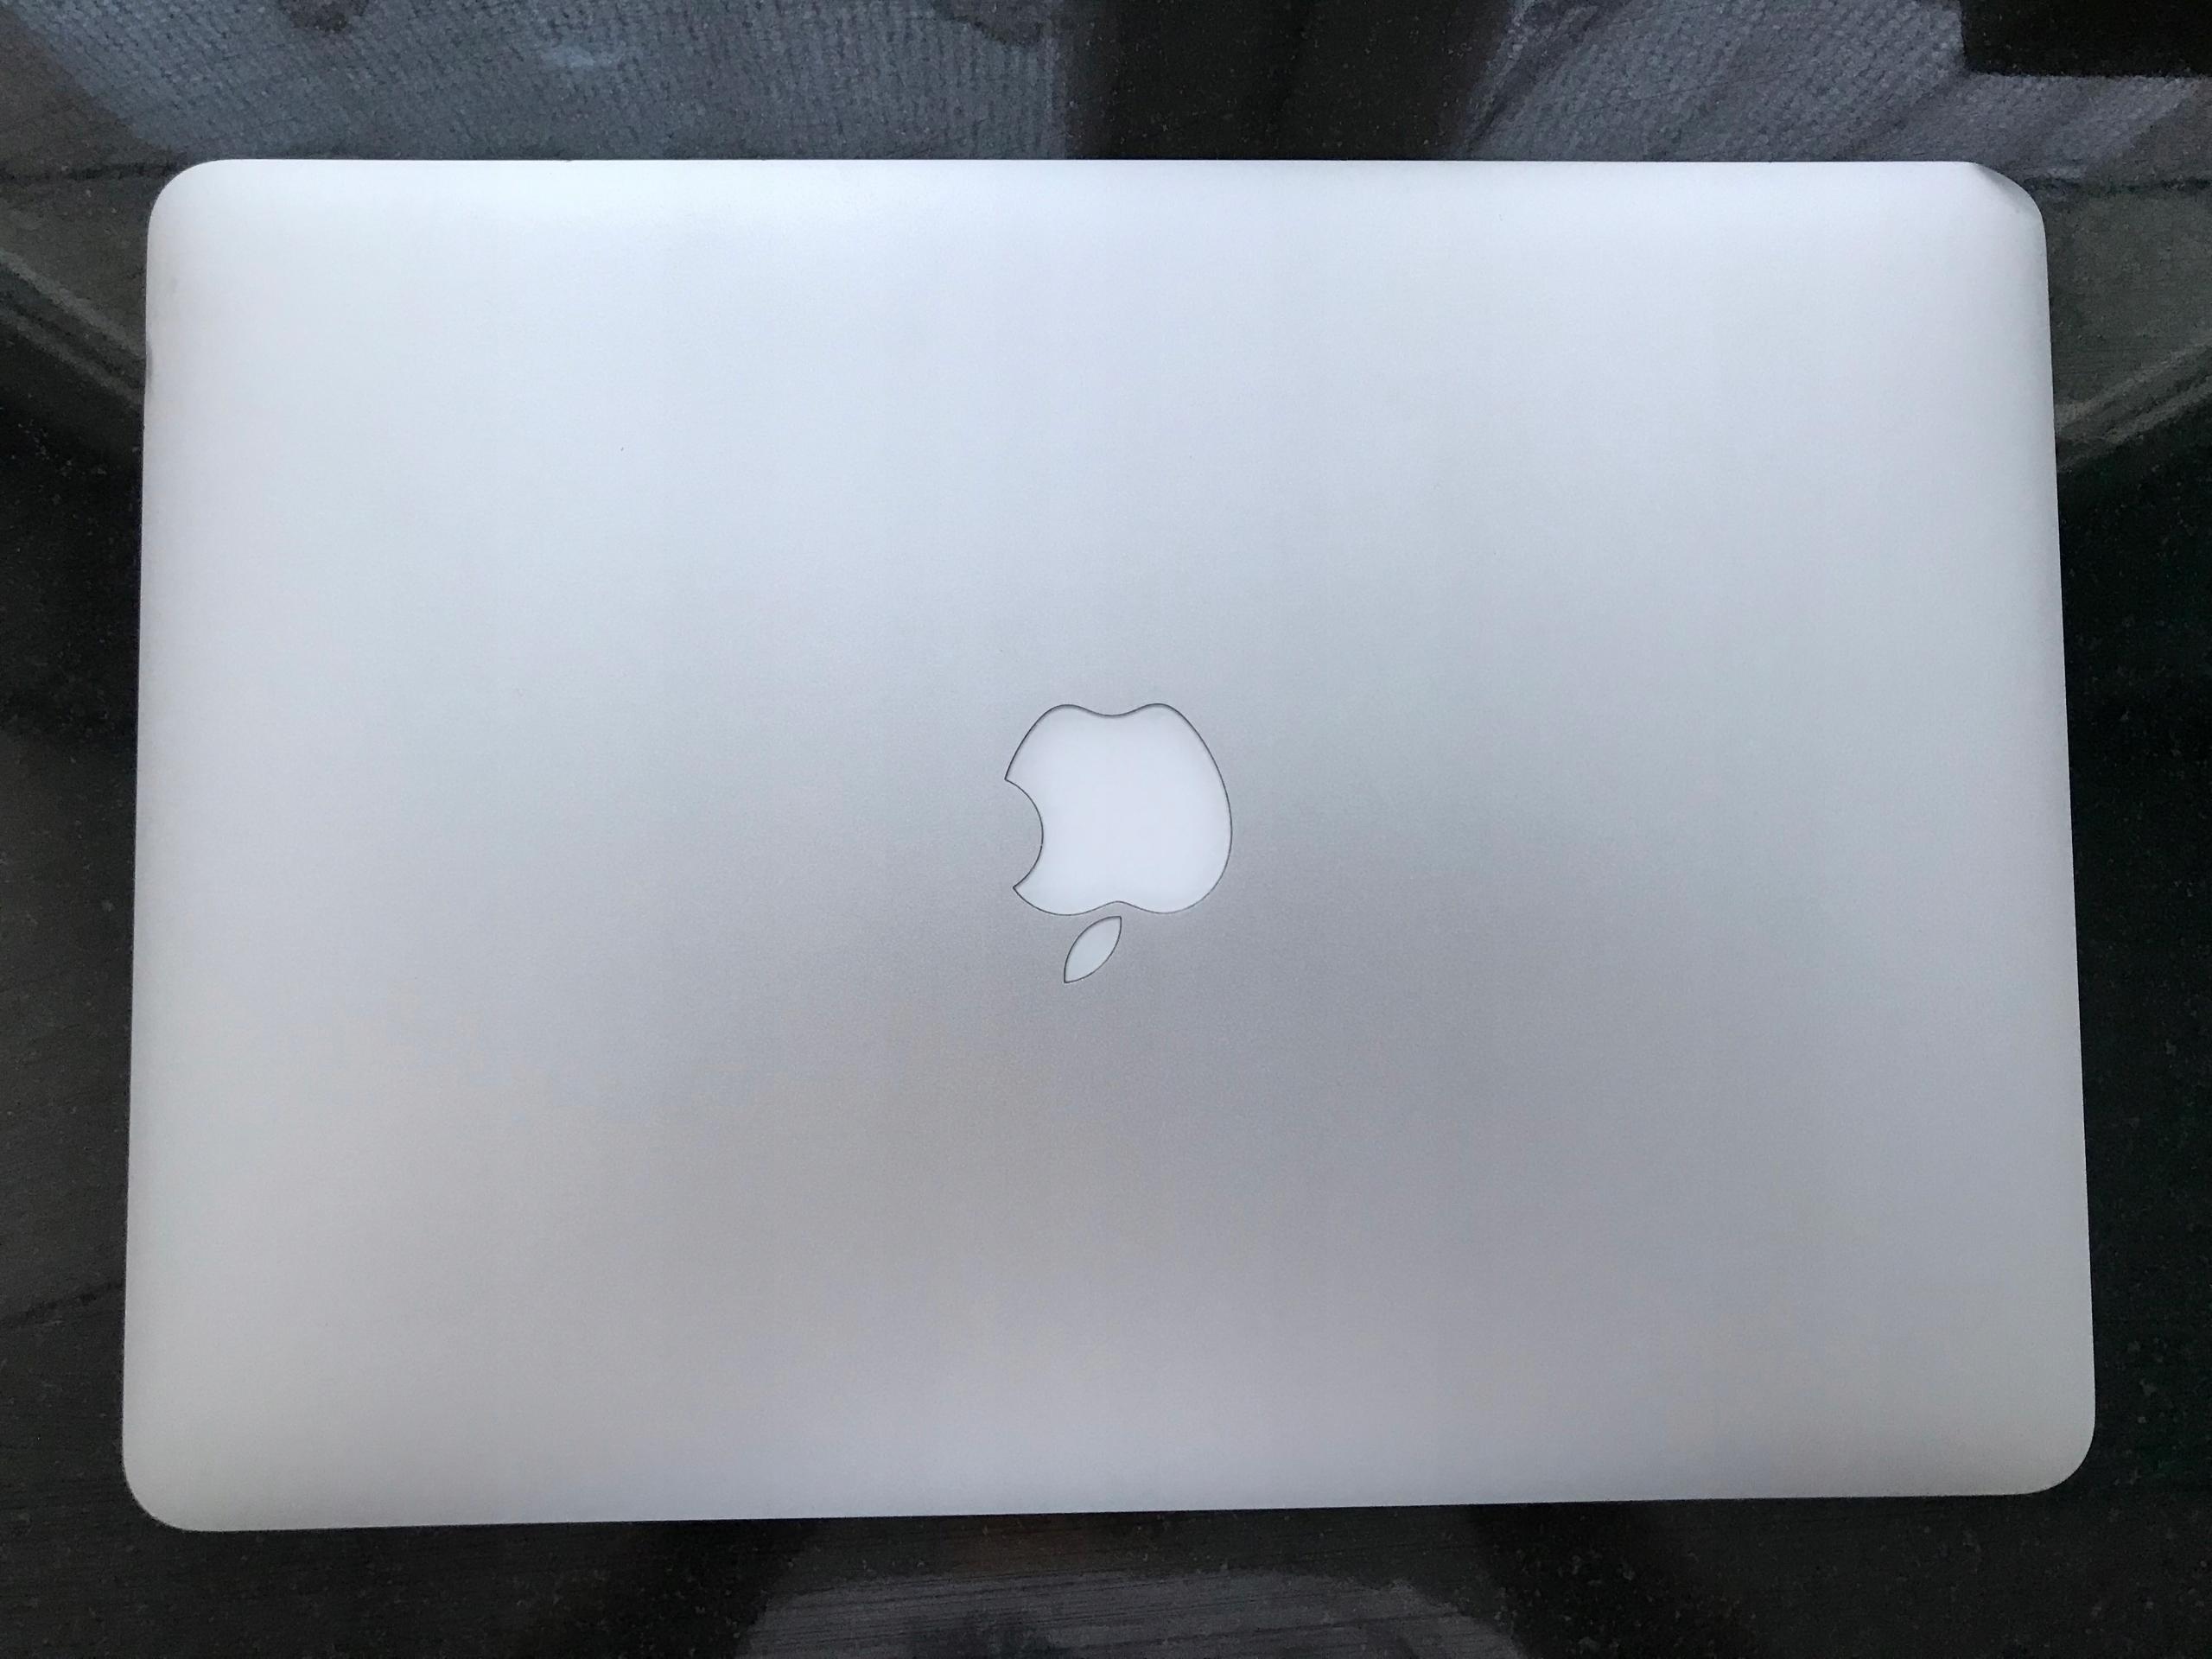 Macbook Air i7 1,8Ghz 120SSD JAK NOWY MID 2011